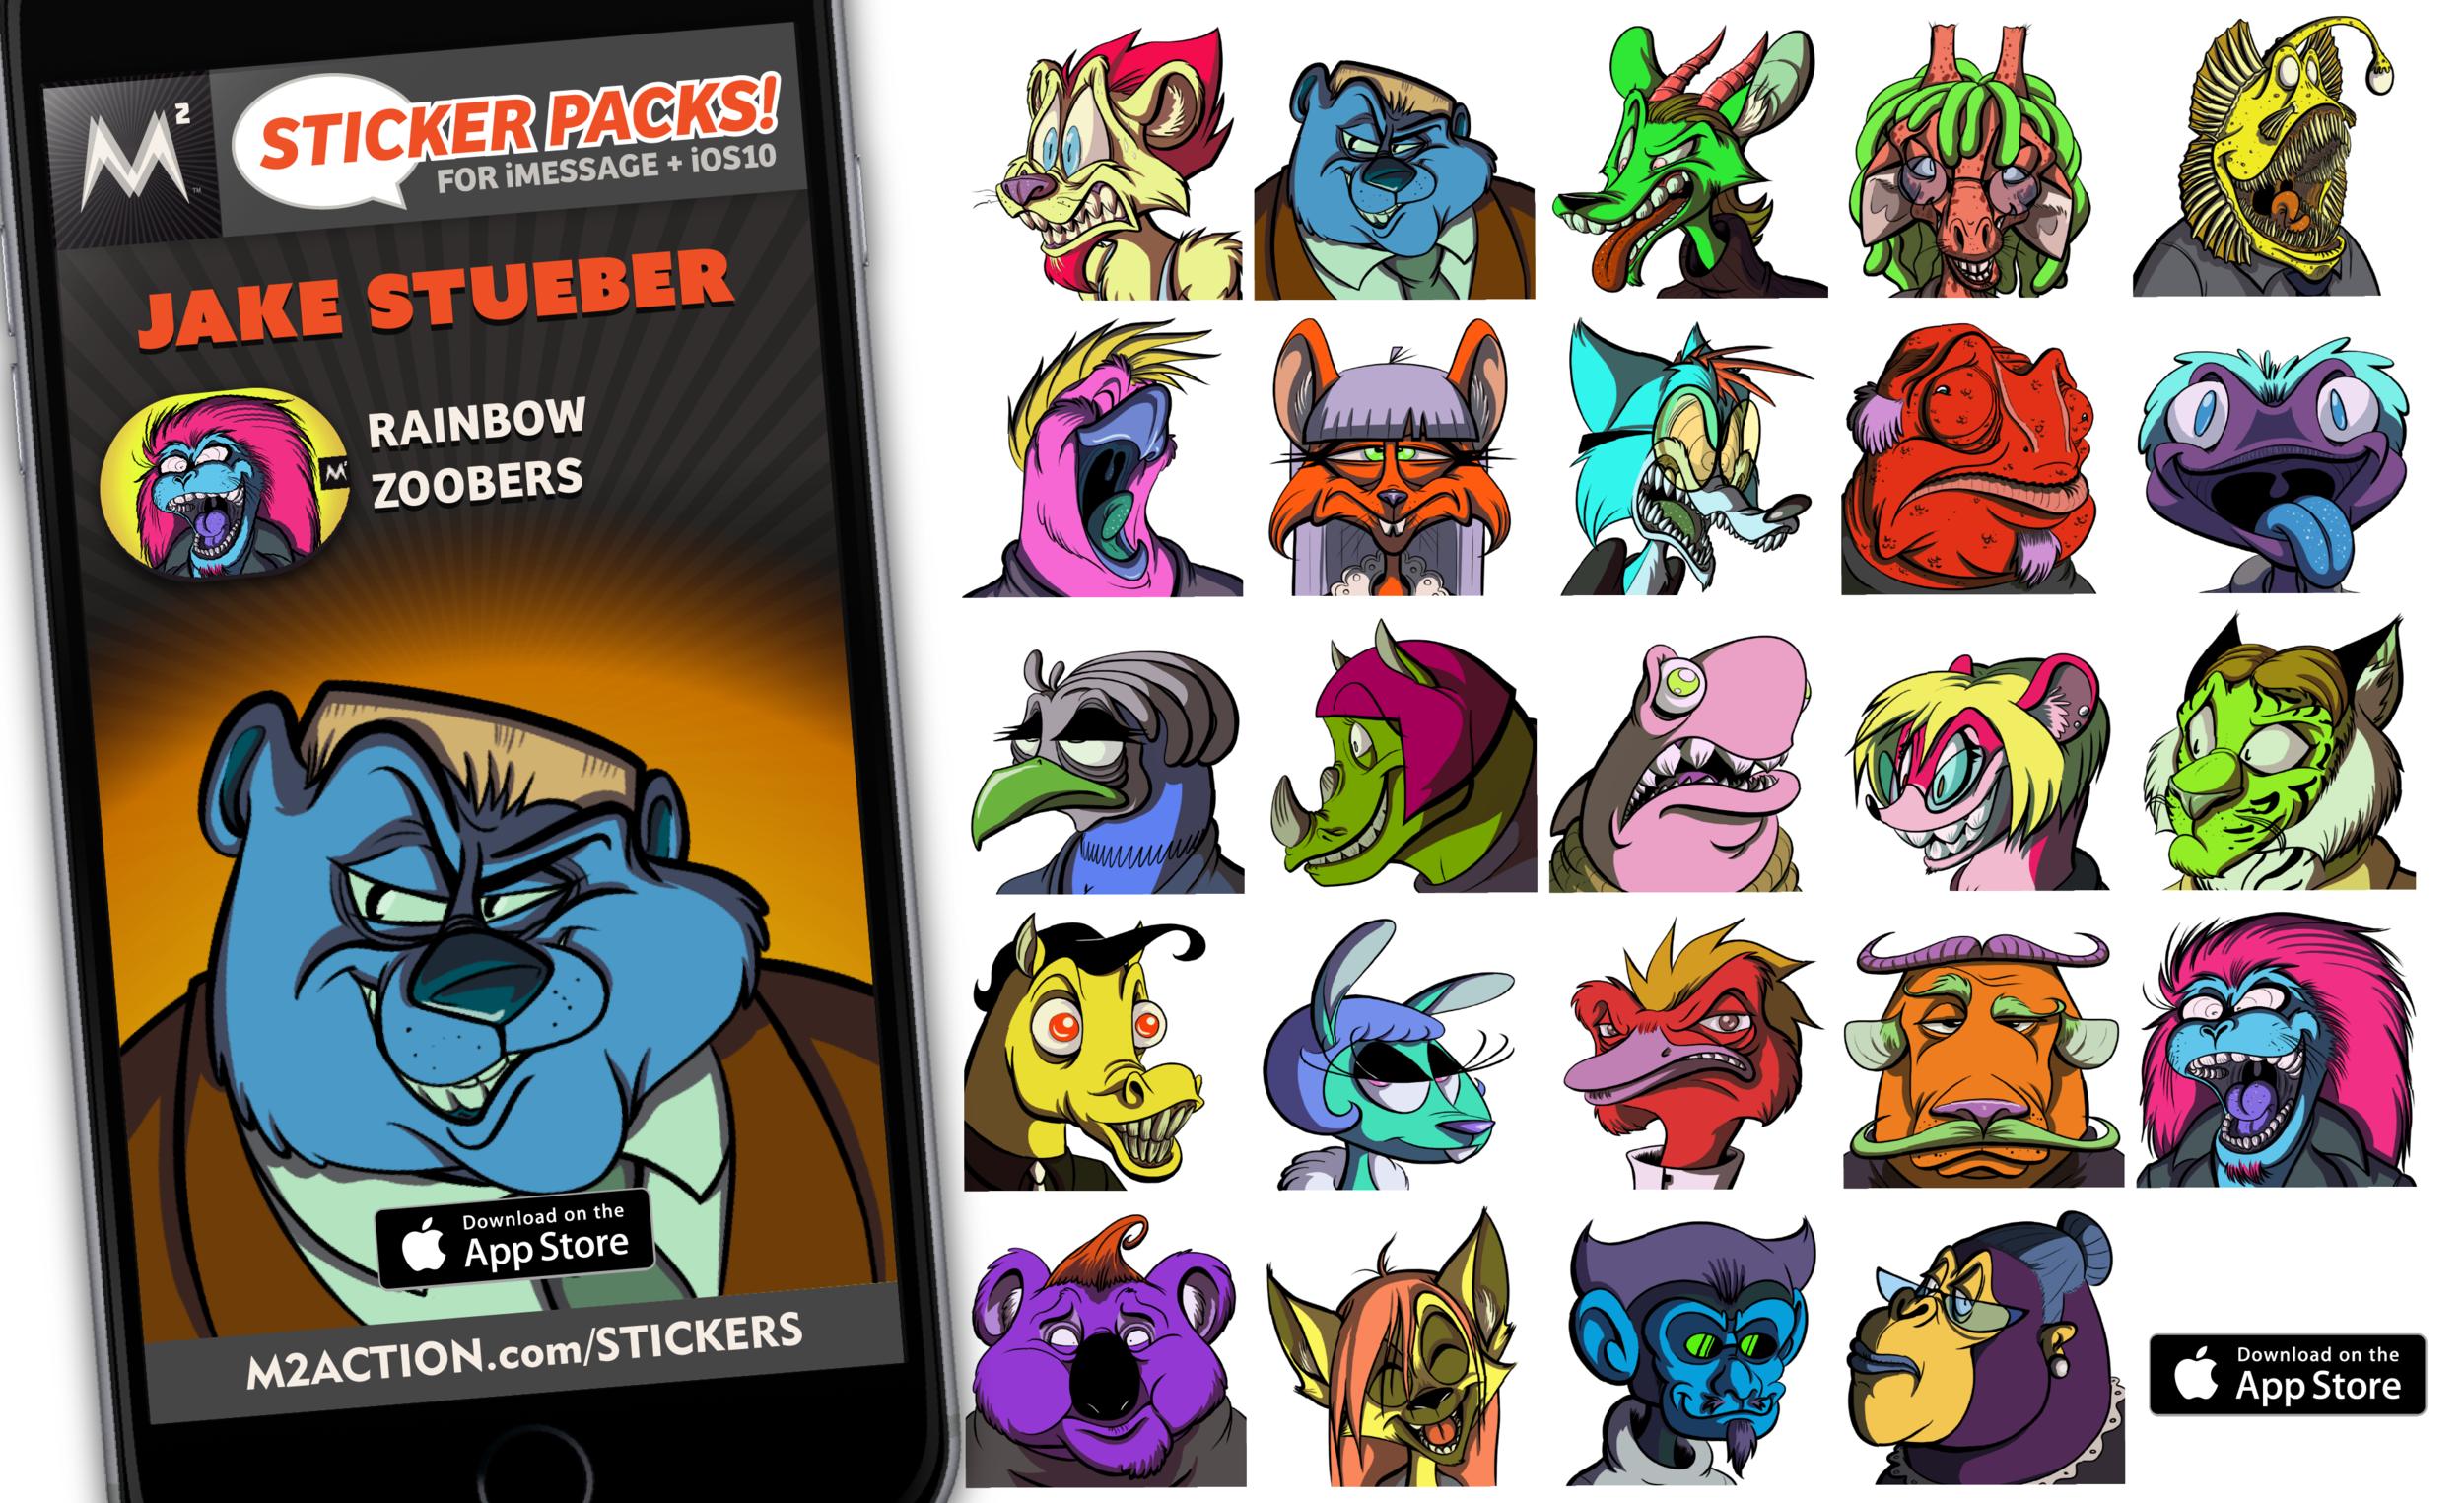 M2_Stickers_Promos_Nov2016_JakeStueber_RainbowZoobers.png